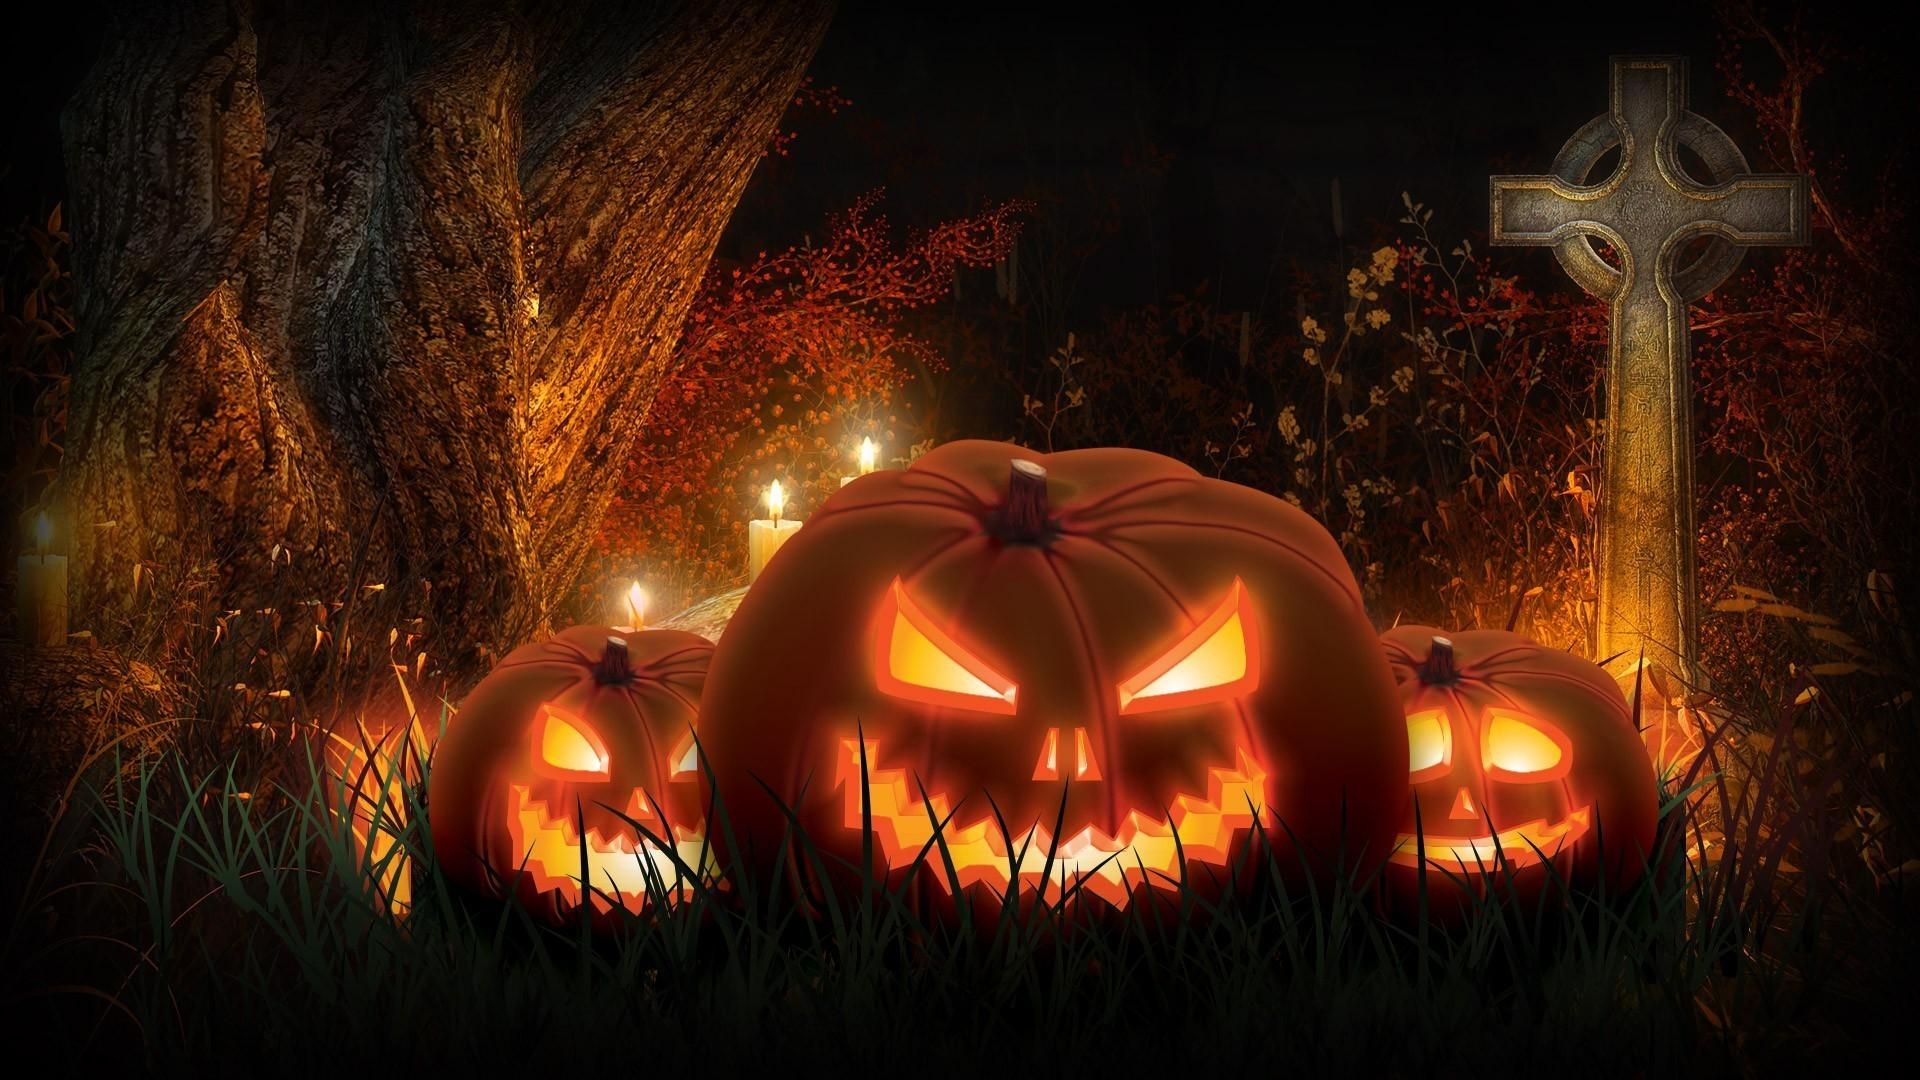 1920x1200 Scary Halloween 2012 HD Wallpapers | Pumpkins, Witches, Spider Web ... Scary Halloween 2012 HD Wallpapers Pumpkins Witches Spider Web